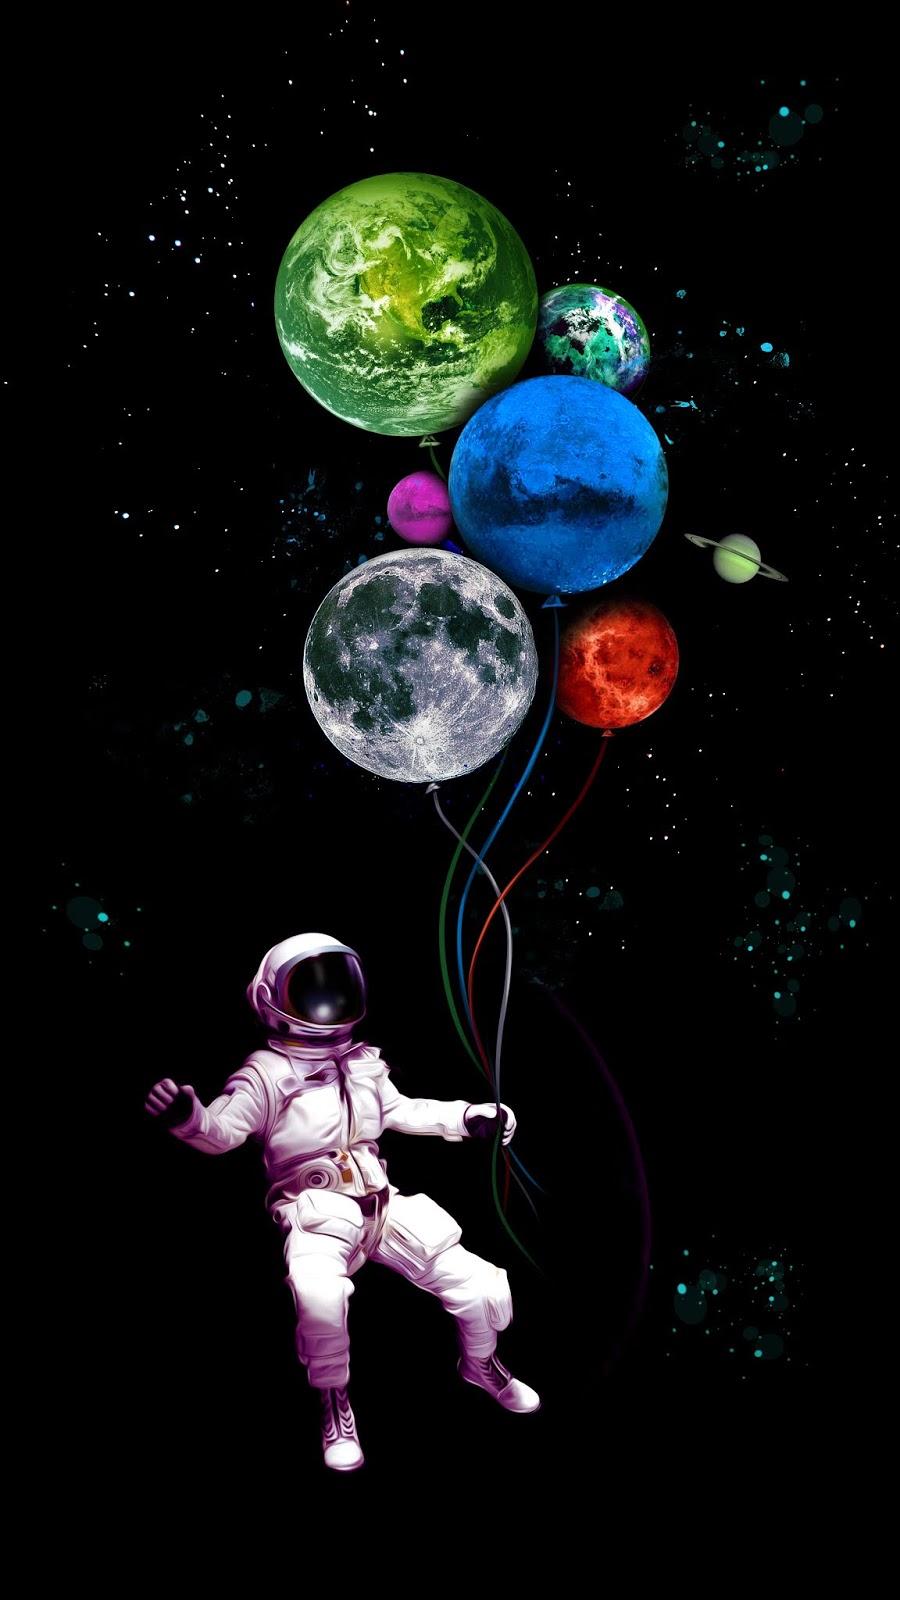 Balloon Planet